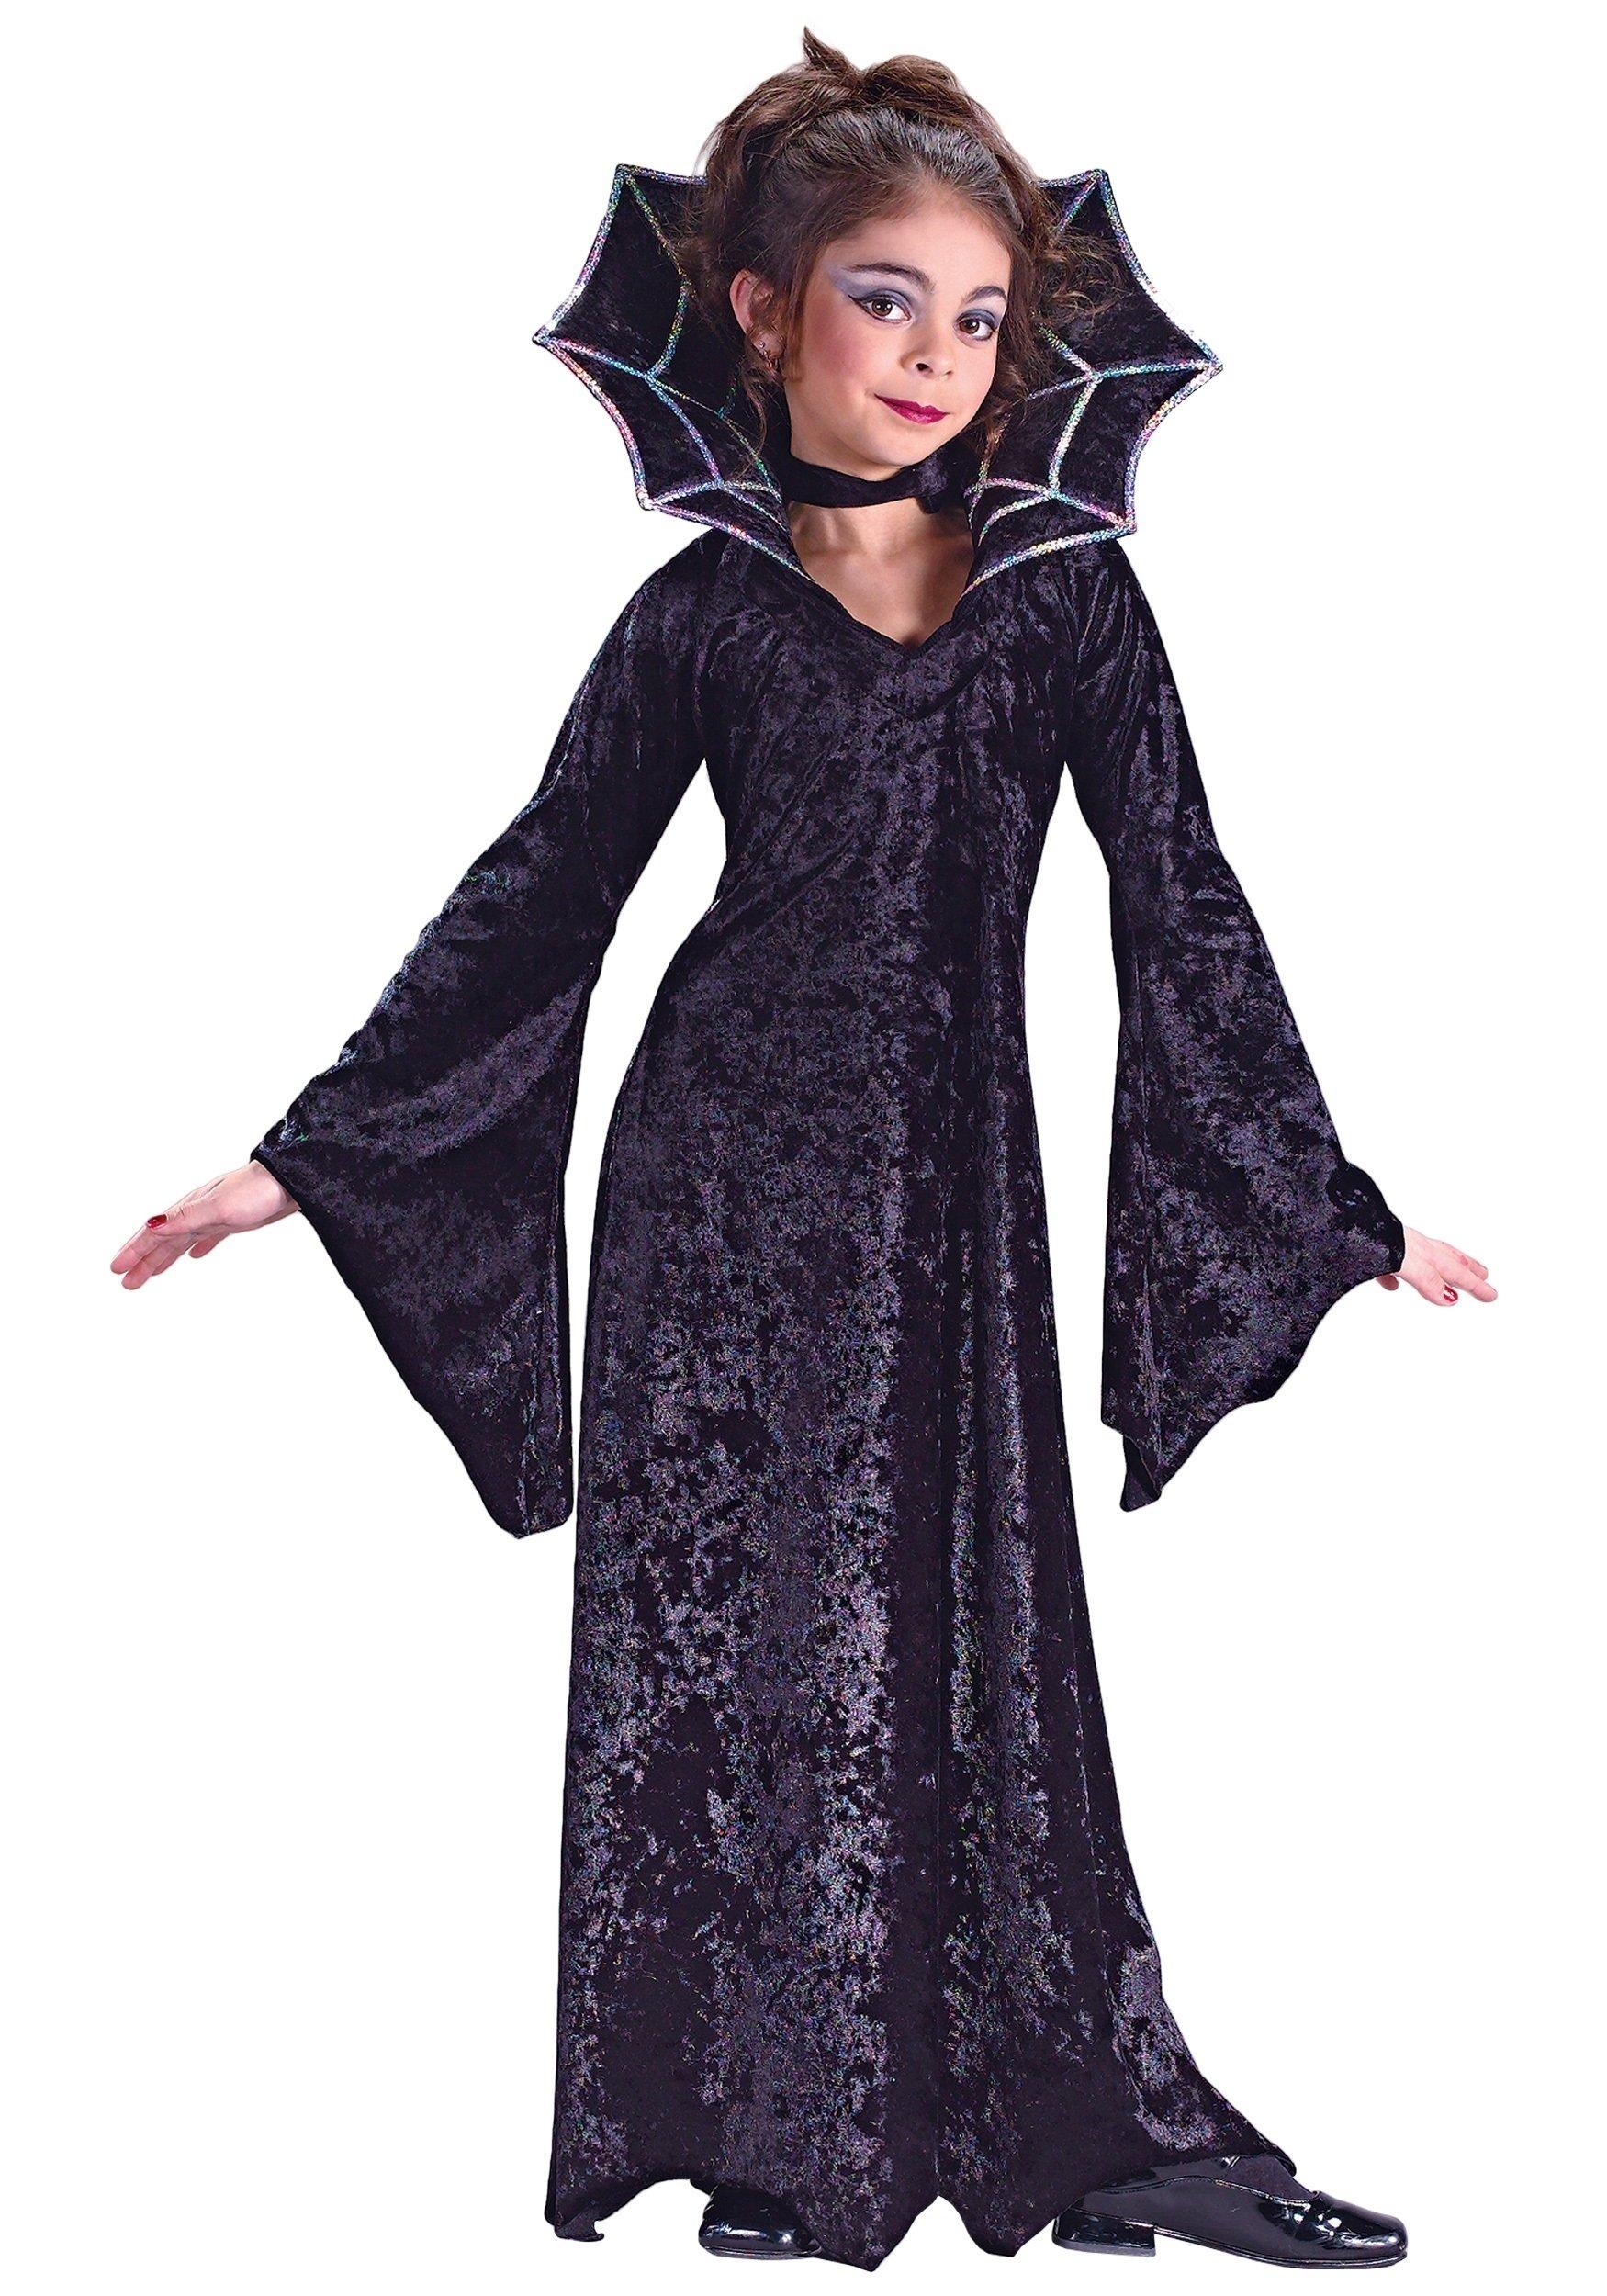 10 Gorgeous Halloween Costumes Ideas For Kids child spiderella costume 4 2021